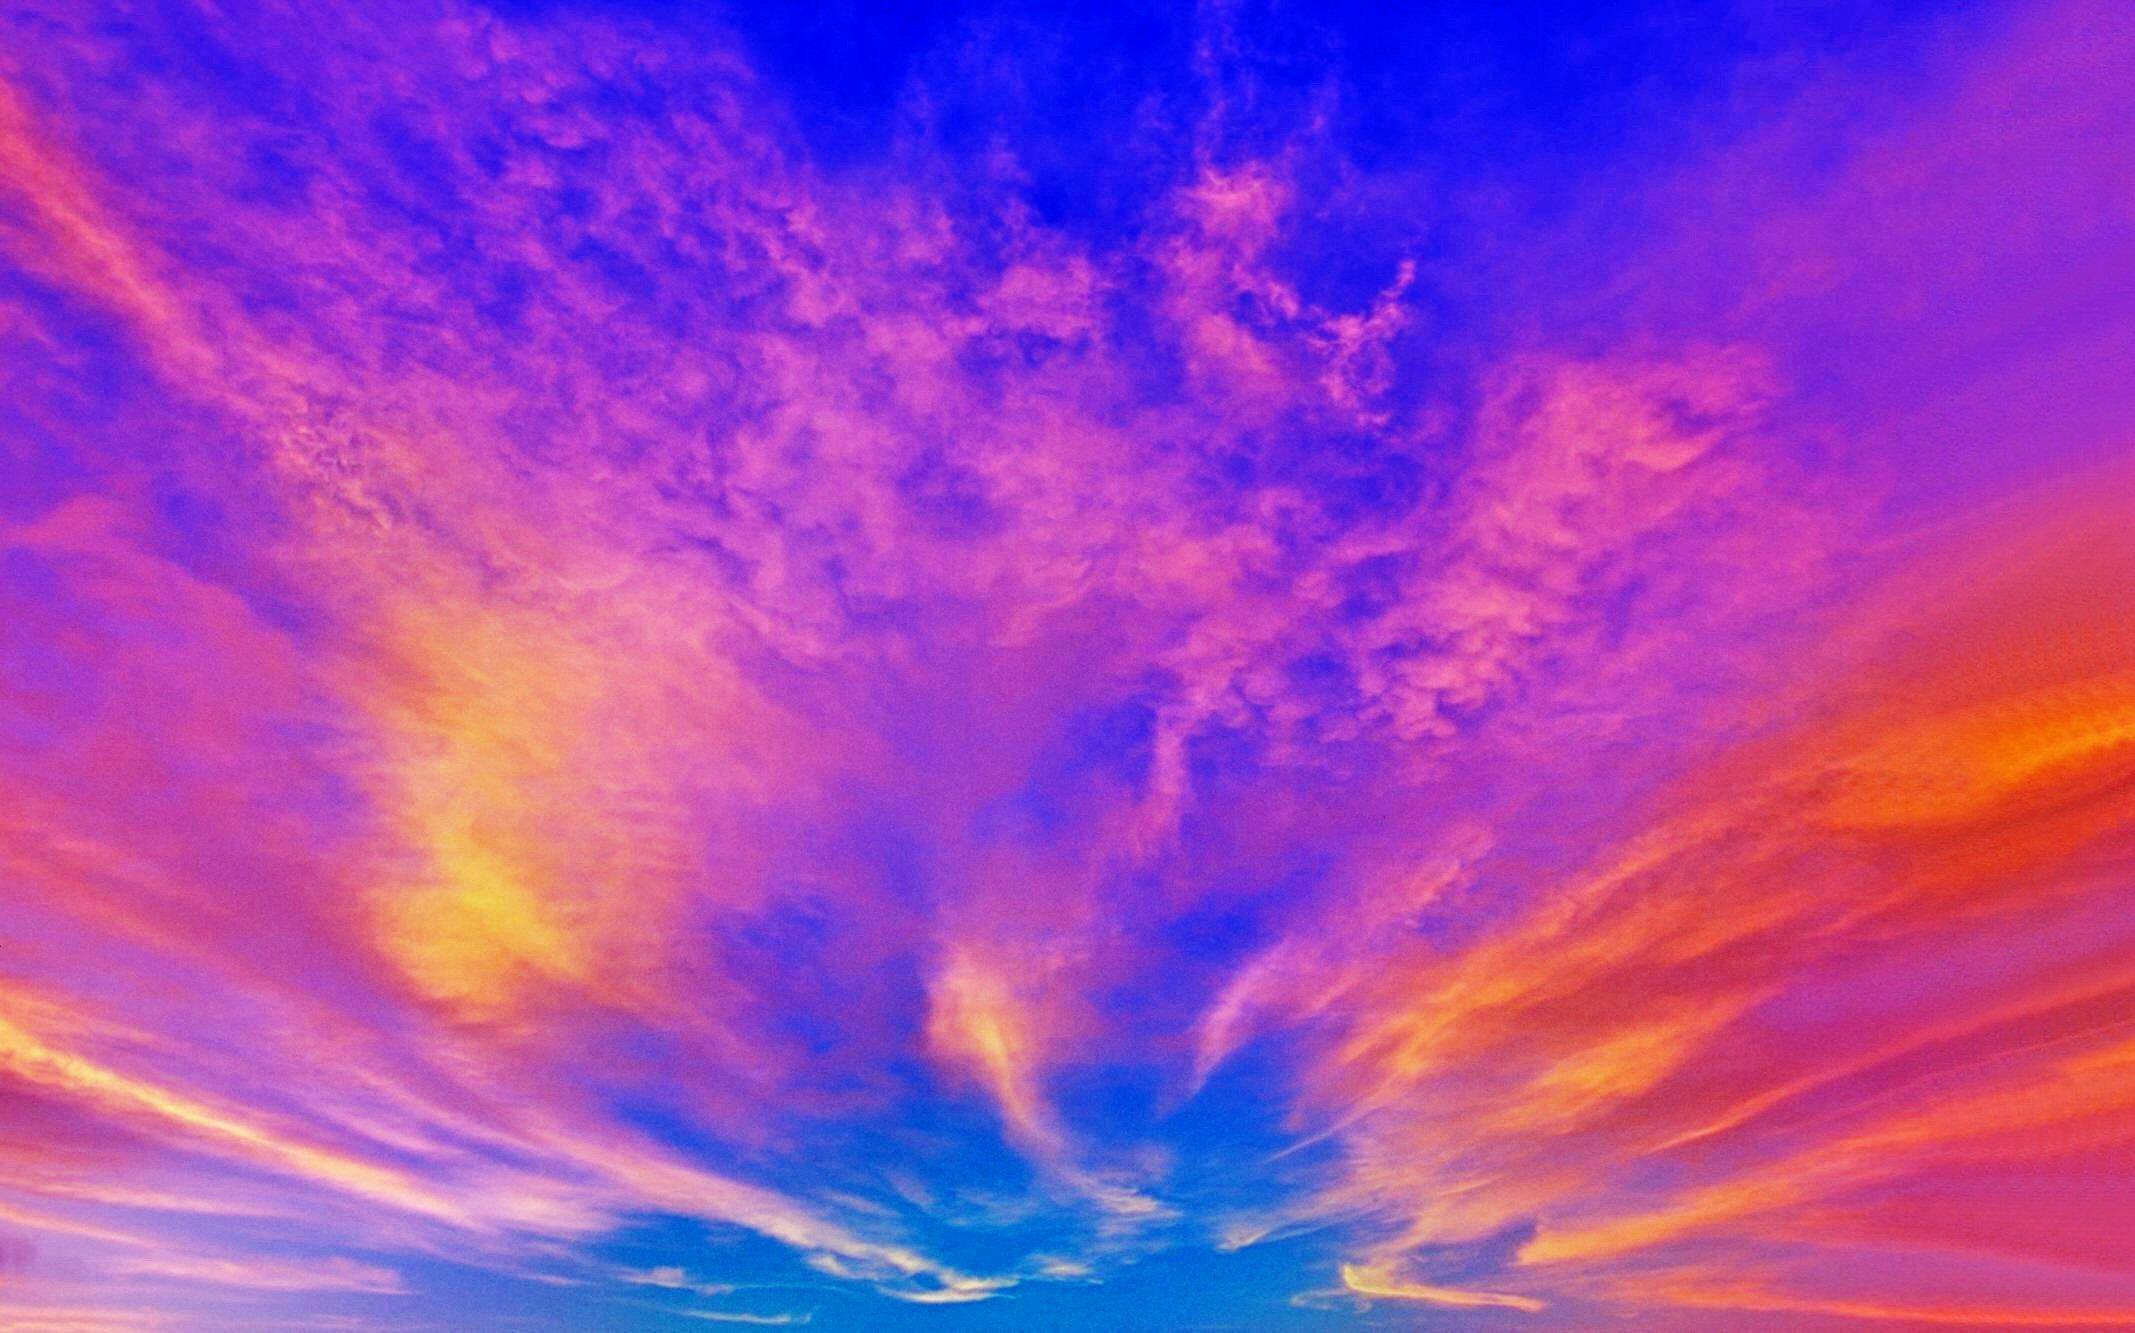 Colorful Sky Wallpaper